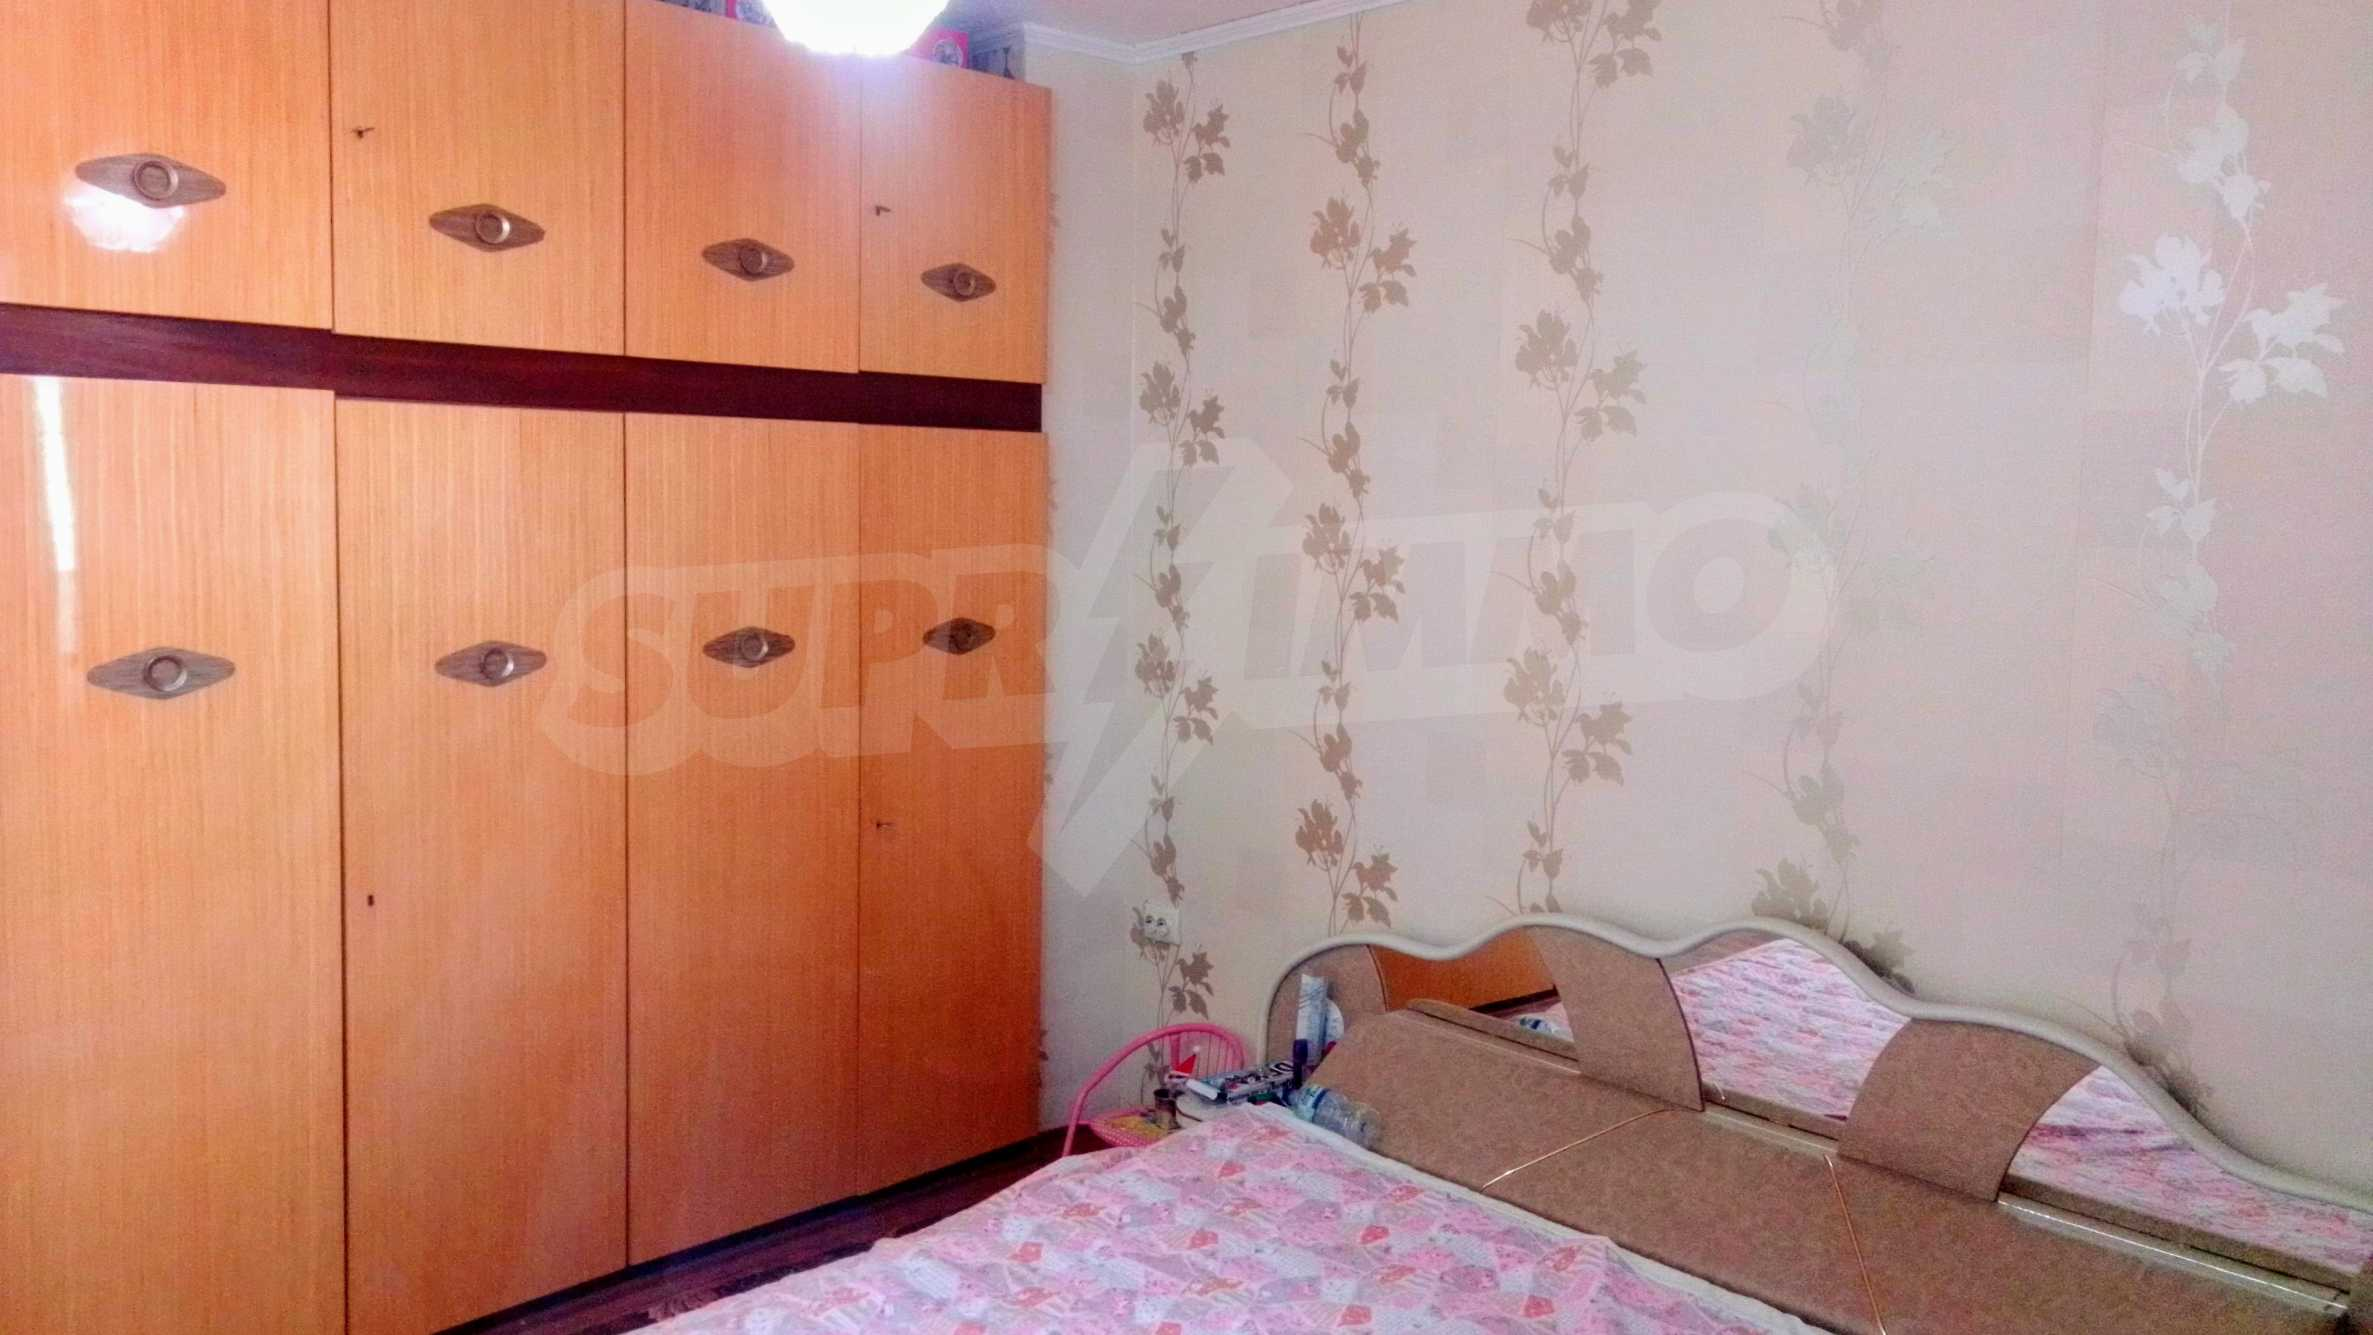 Слънчев тристаен апартамент в град Севлиево  4